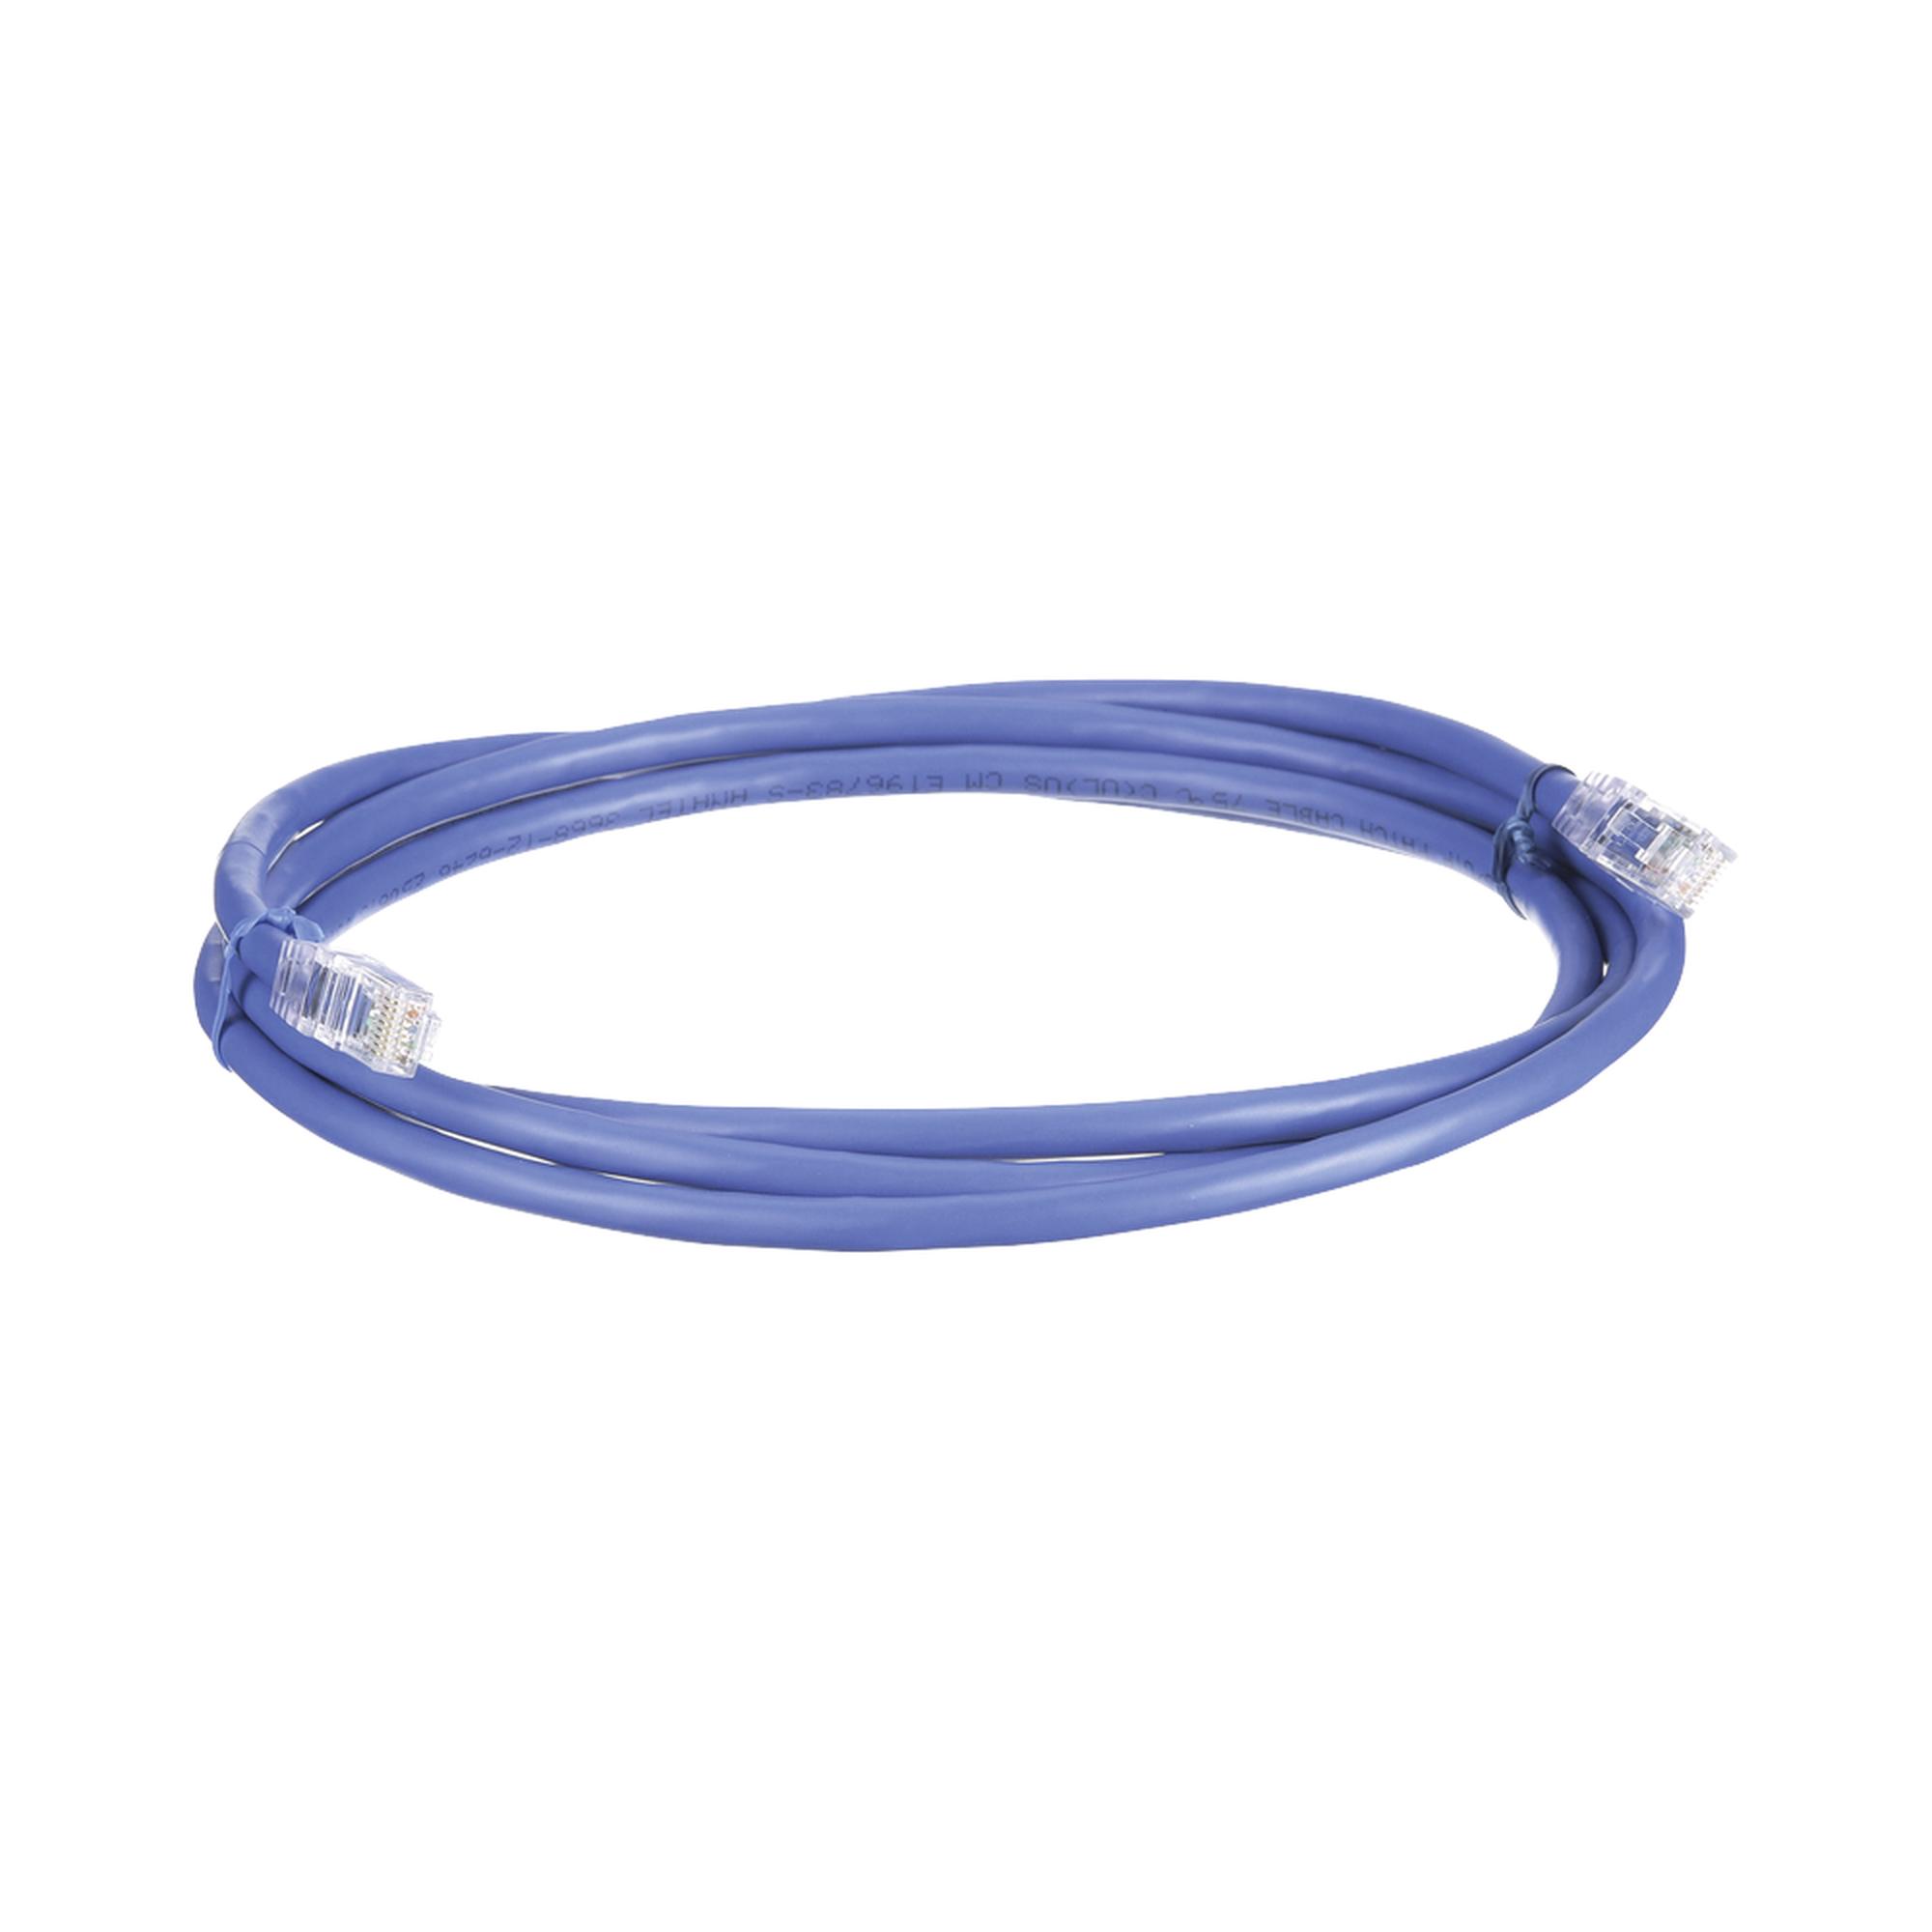 Cable de Parcheo UTP, Cat6A, 24 AWG, CM, Color Azul, 5ft